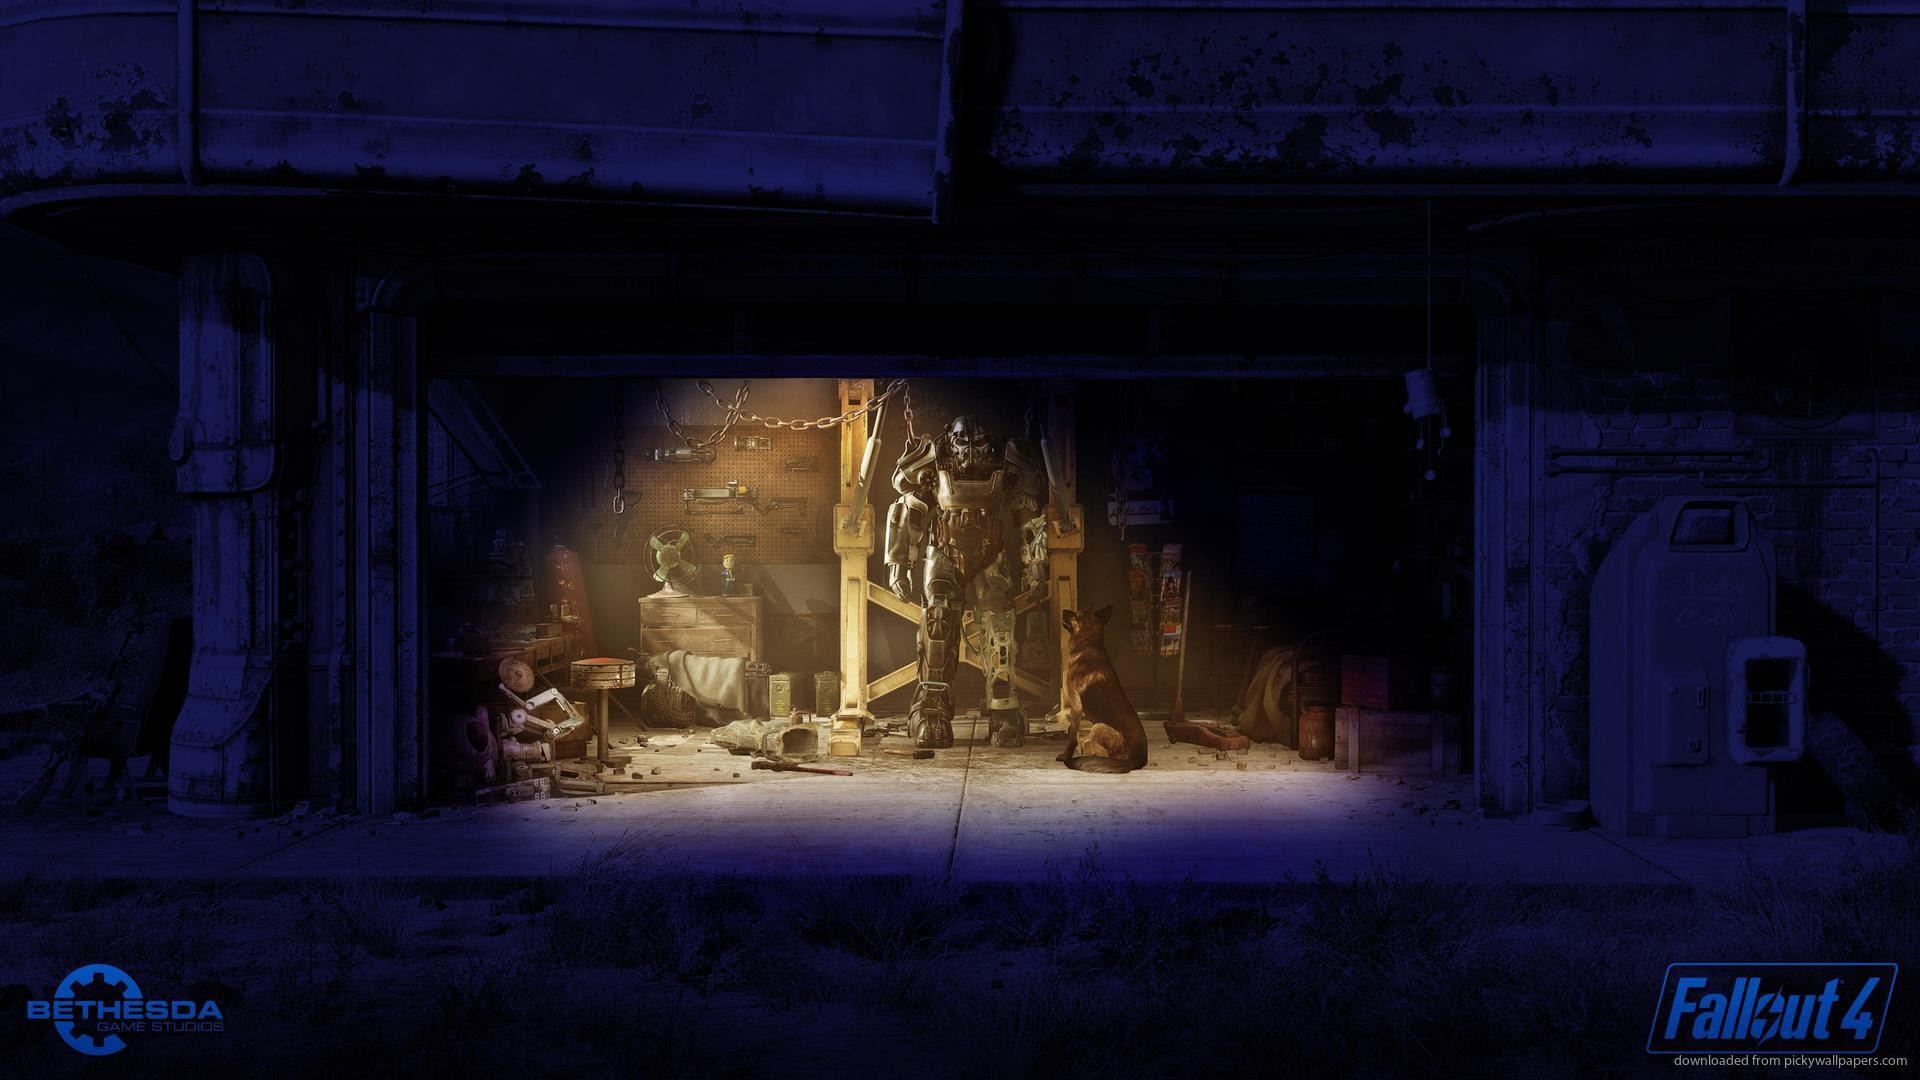 Fallout 4 Garage Wallpaper 89 Images